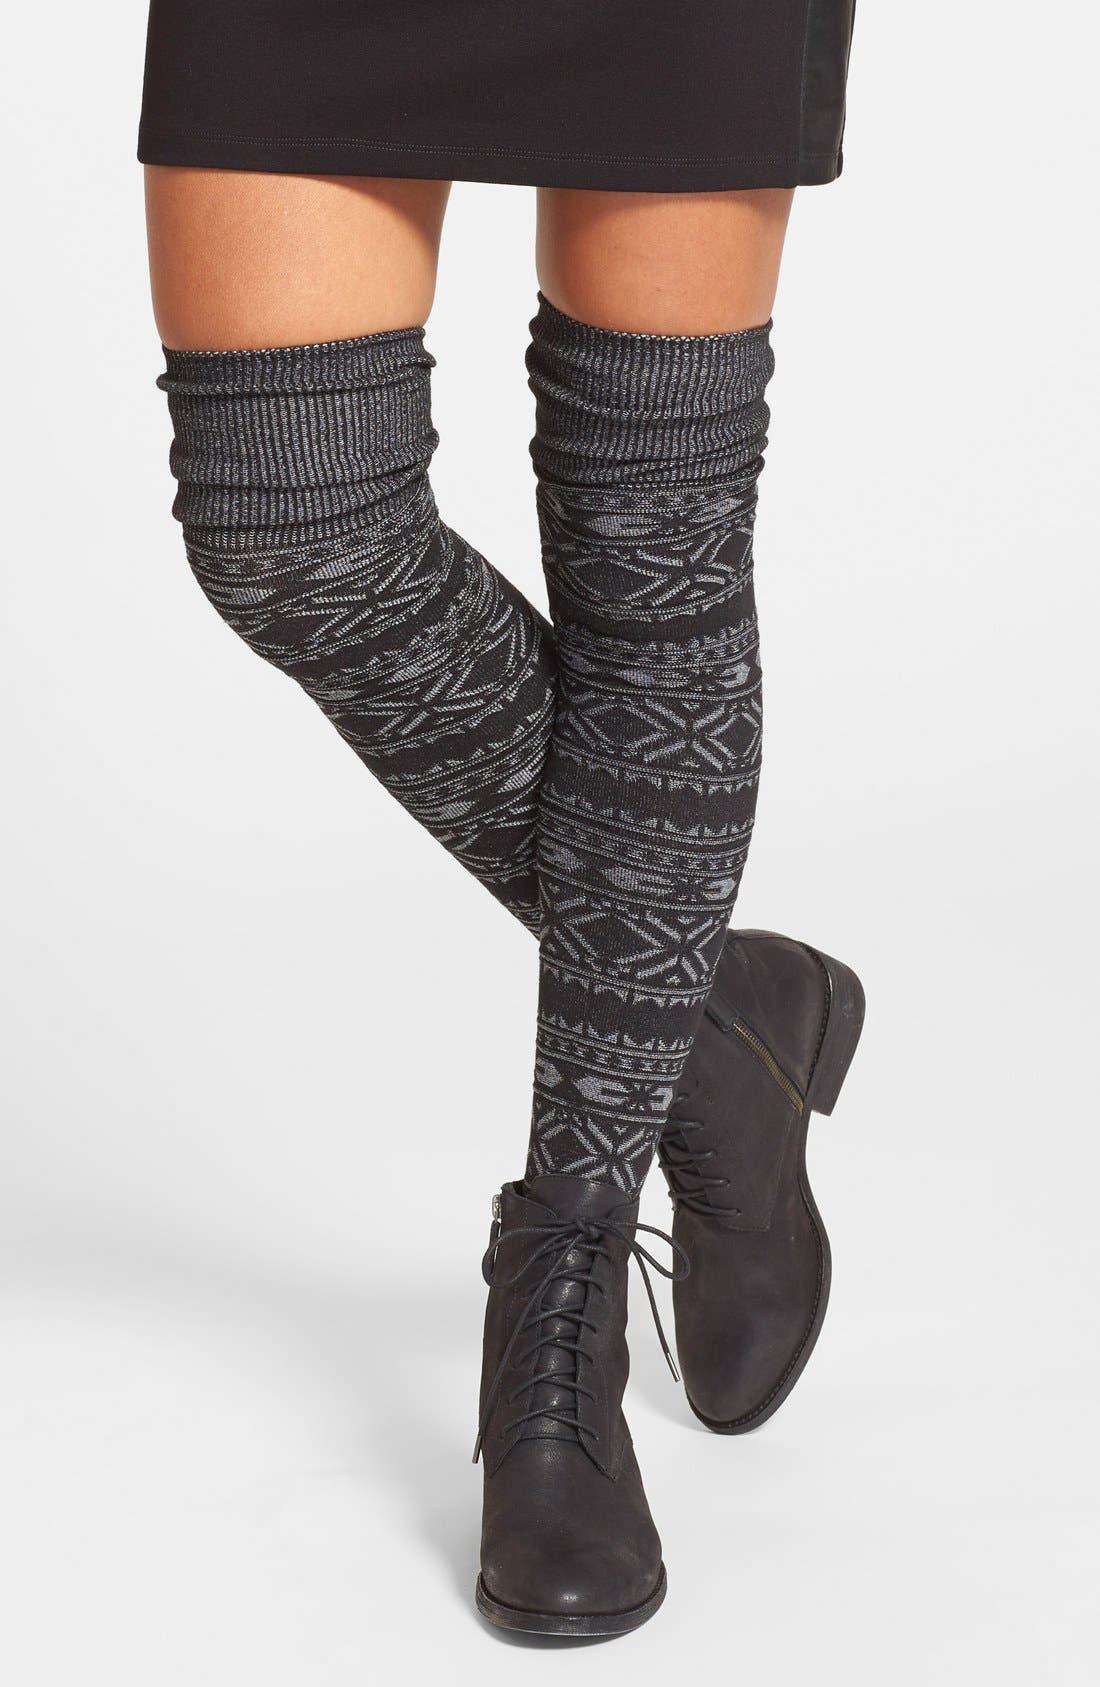 Hue 'Fair Isle' Over the Knee Socks | Nordstrom